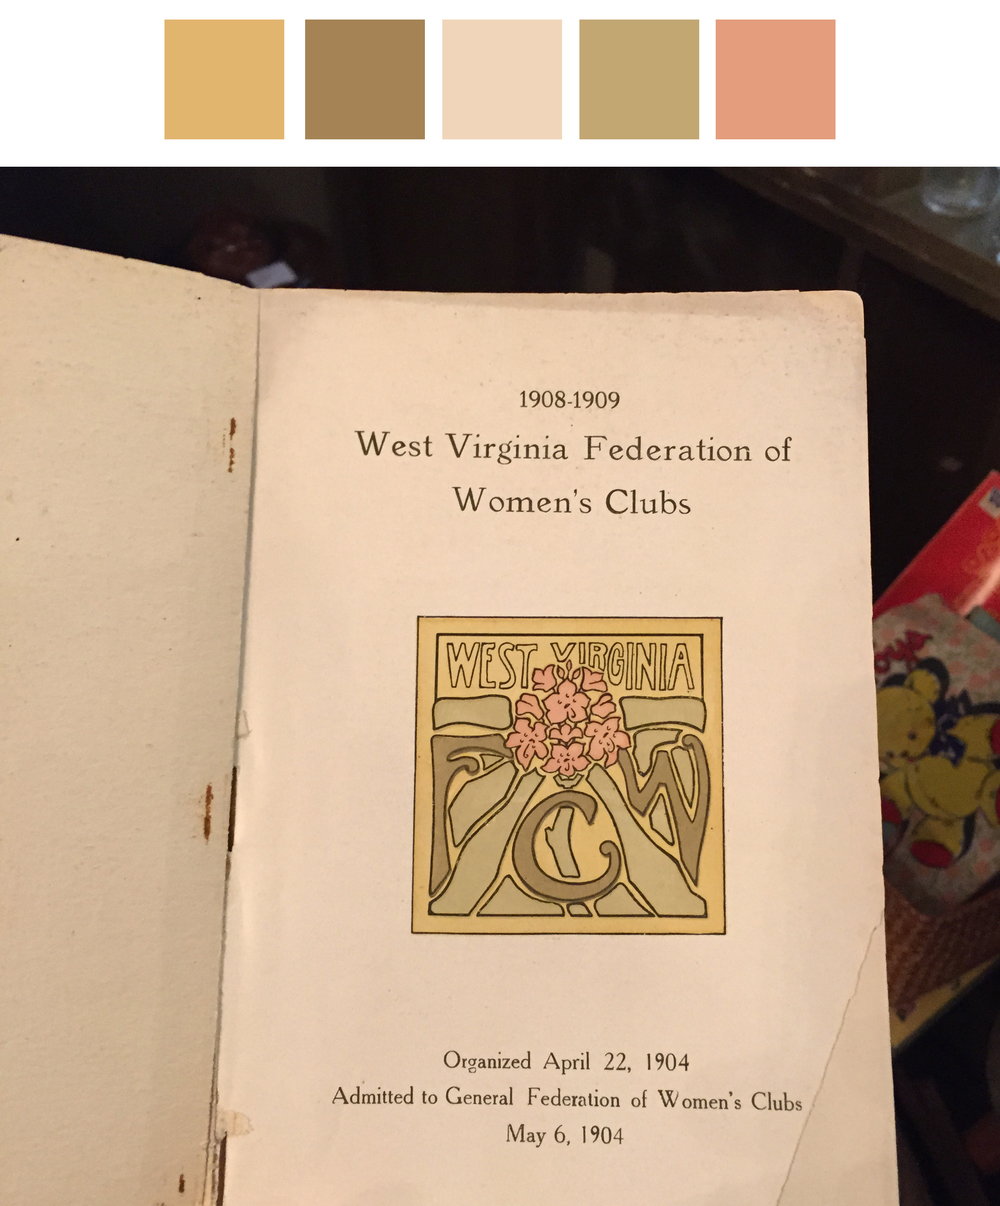 wv-book.jpg